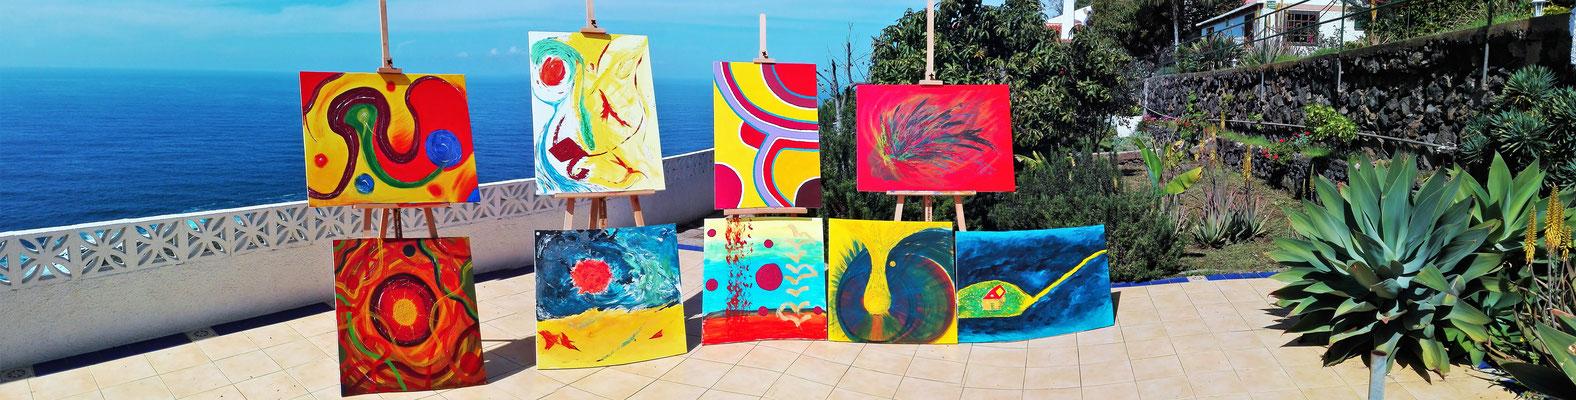 Seminar Intuitives Malen auf Teneriffa